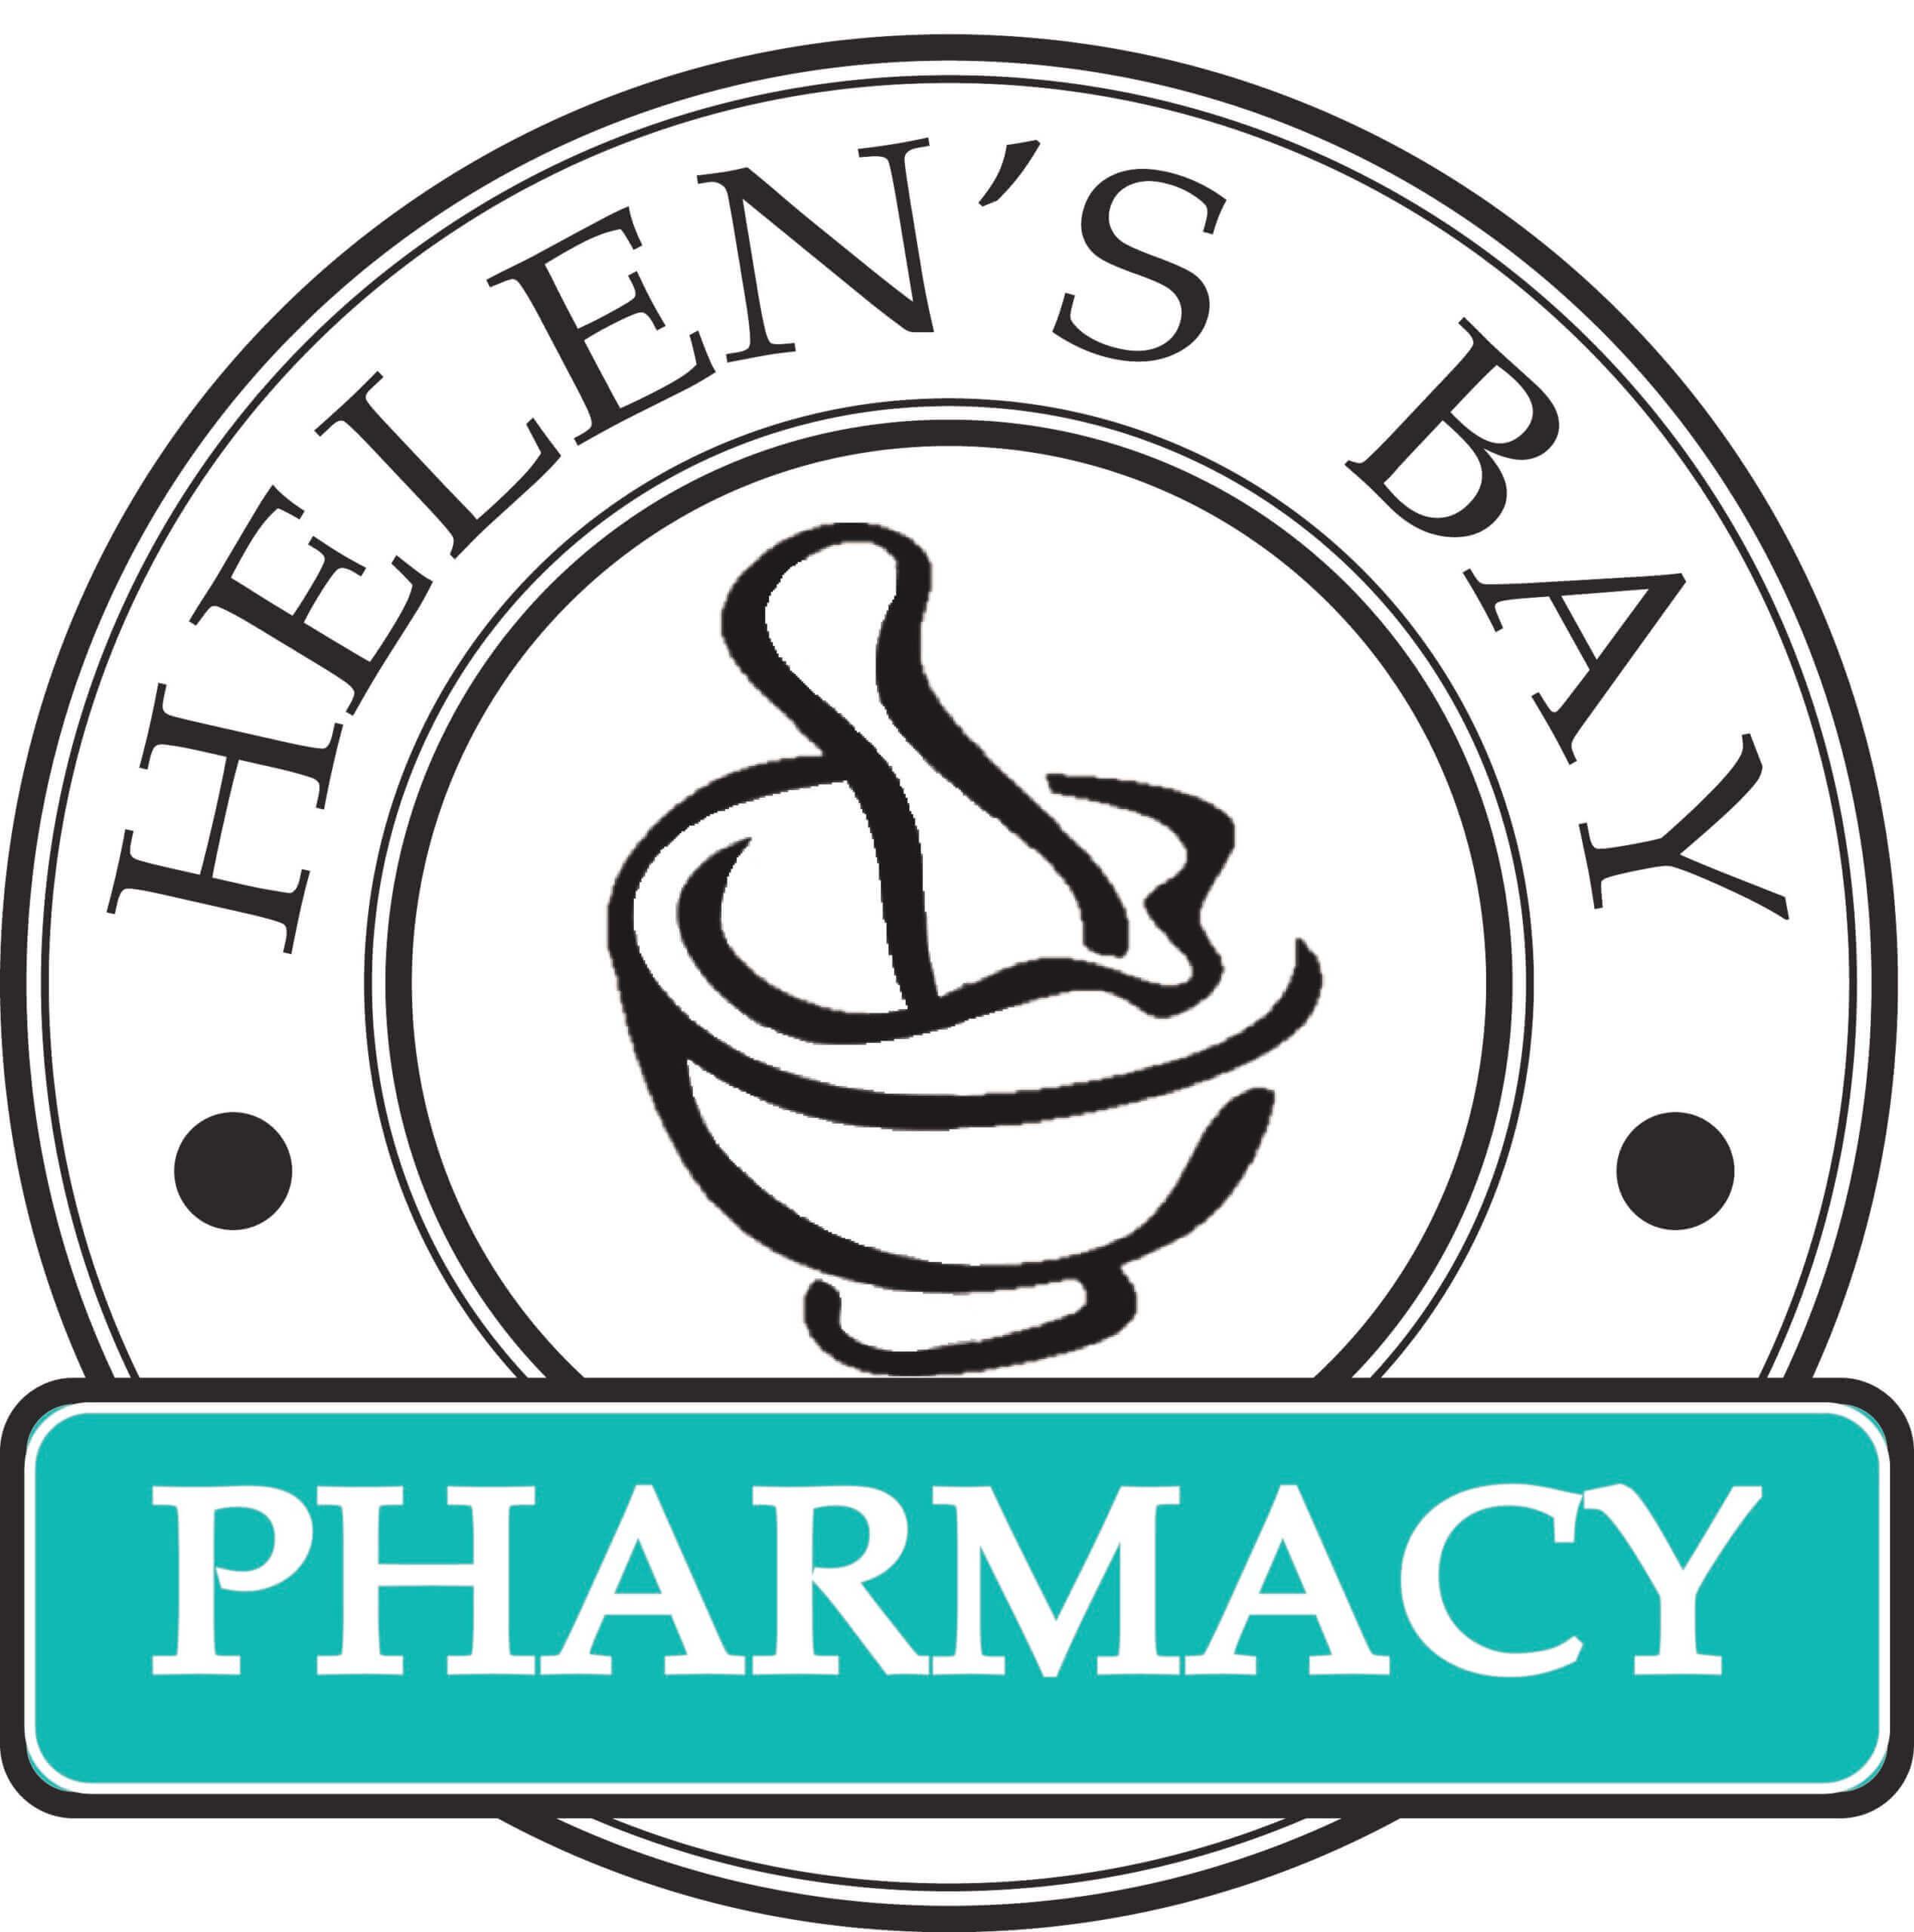 Helen's Bay Pharmacy